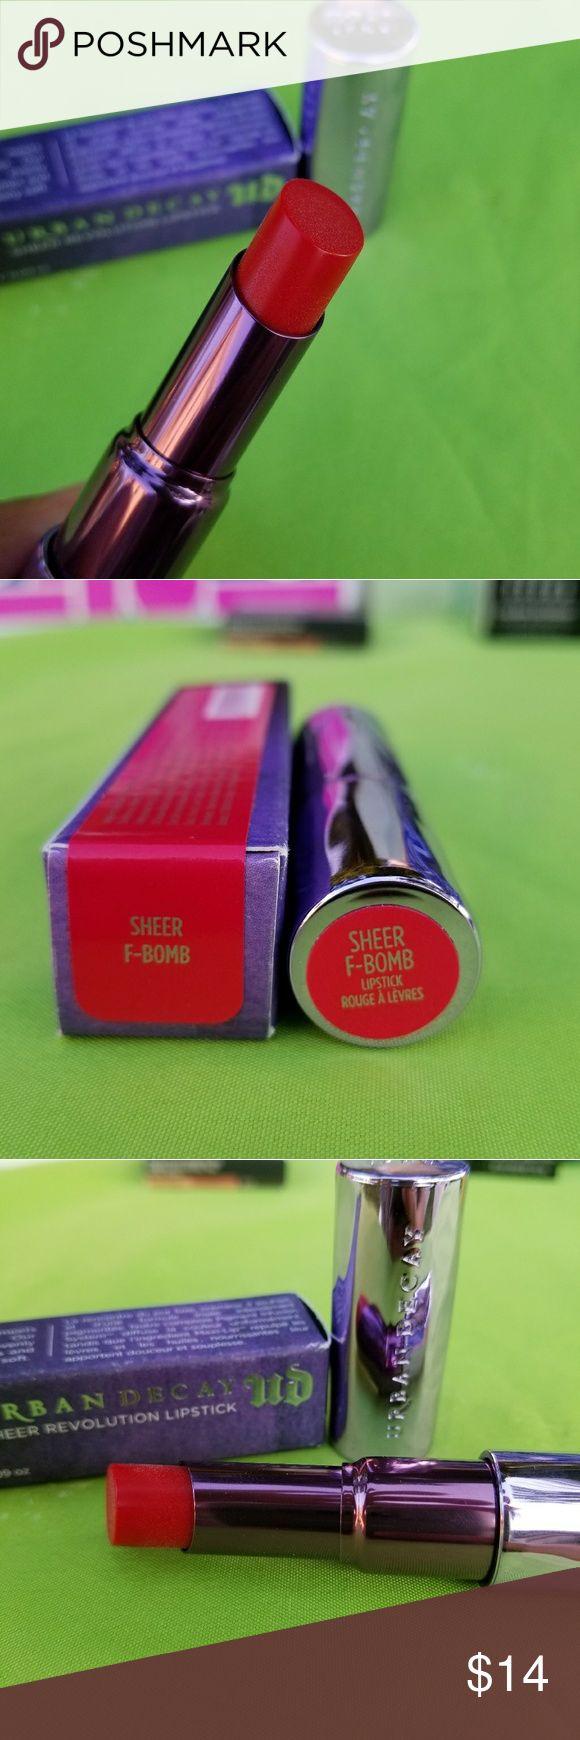 Urban decay revolution lipstick. Sheer f-bomb. New. Urban decay revolution lipstick color.  SHEER F-BOMB.  full size. Urban Decay Makeup Lipstick